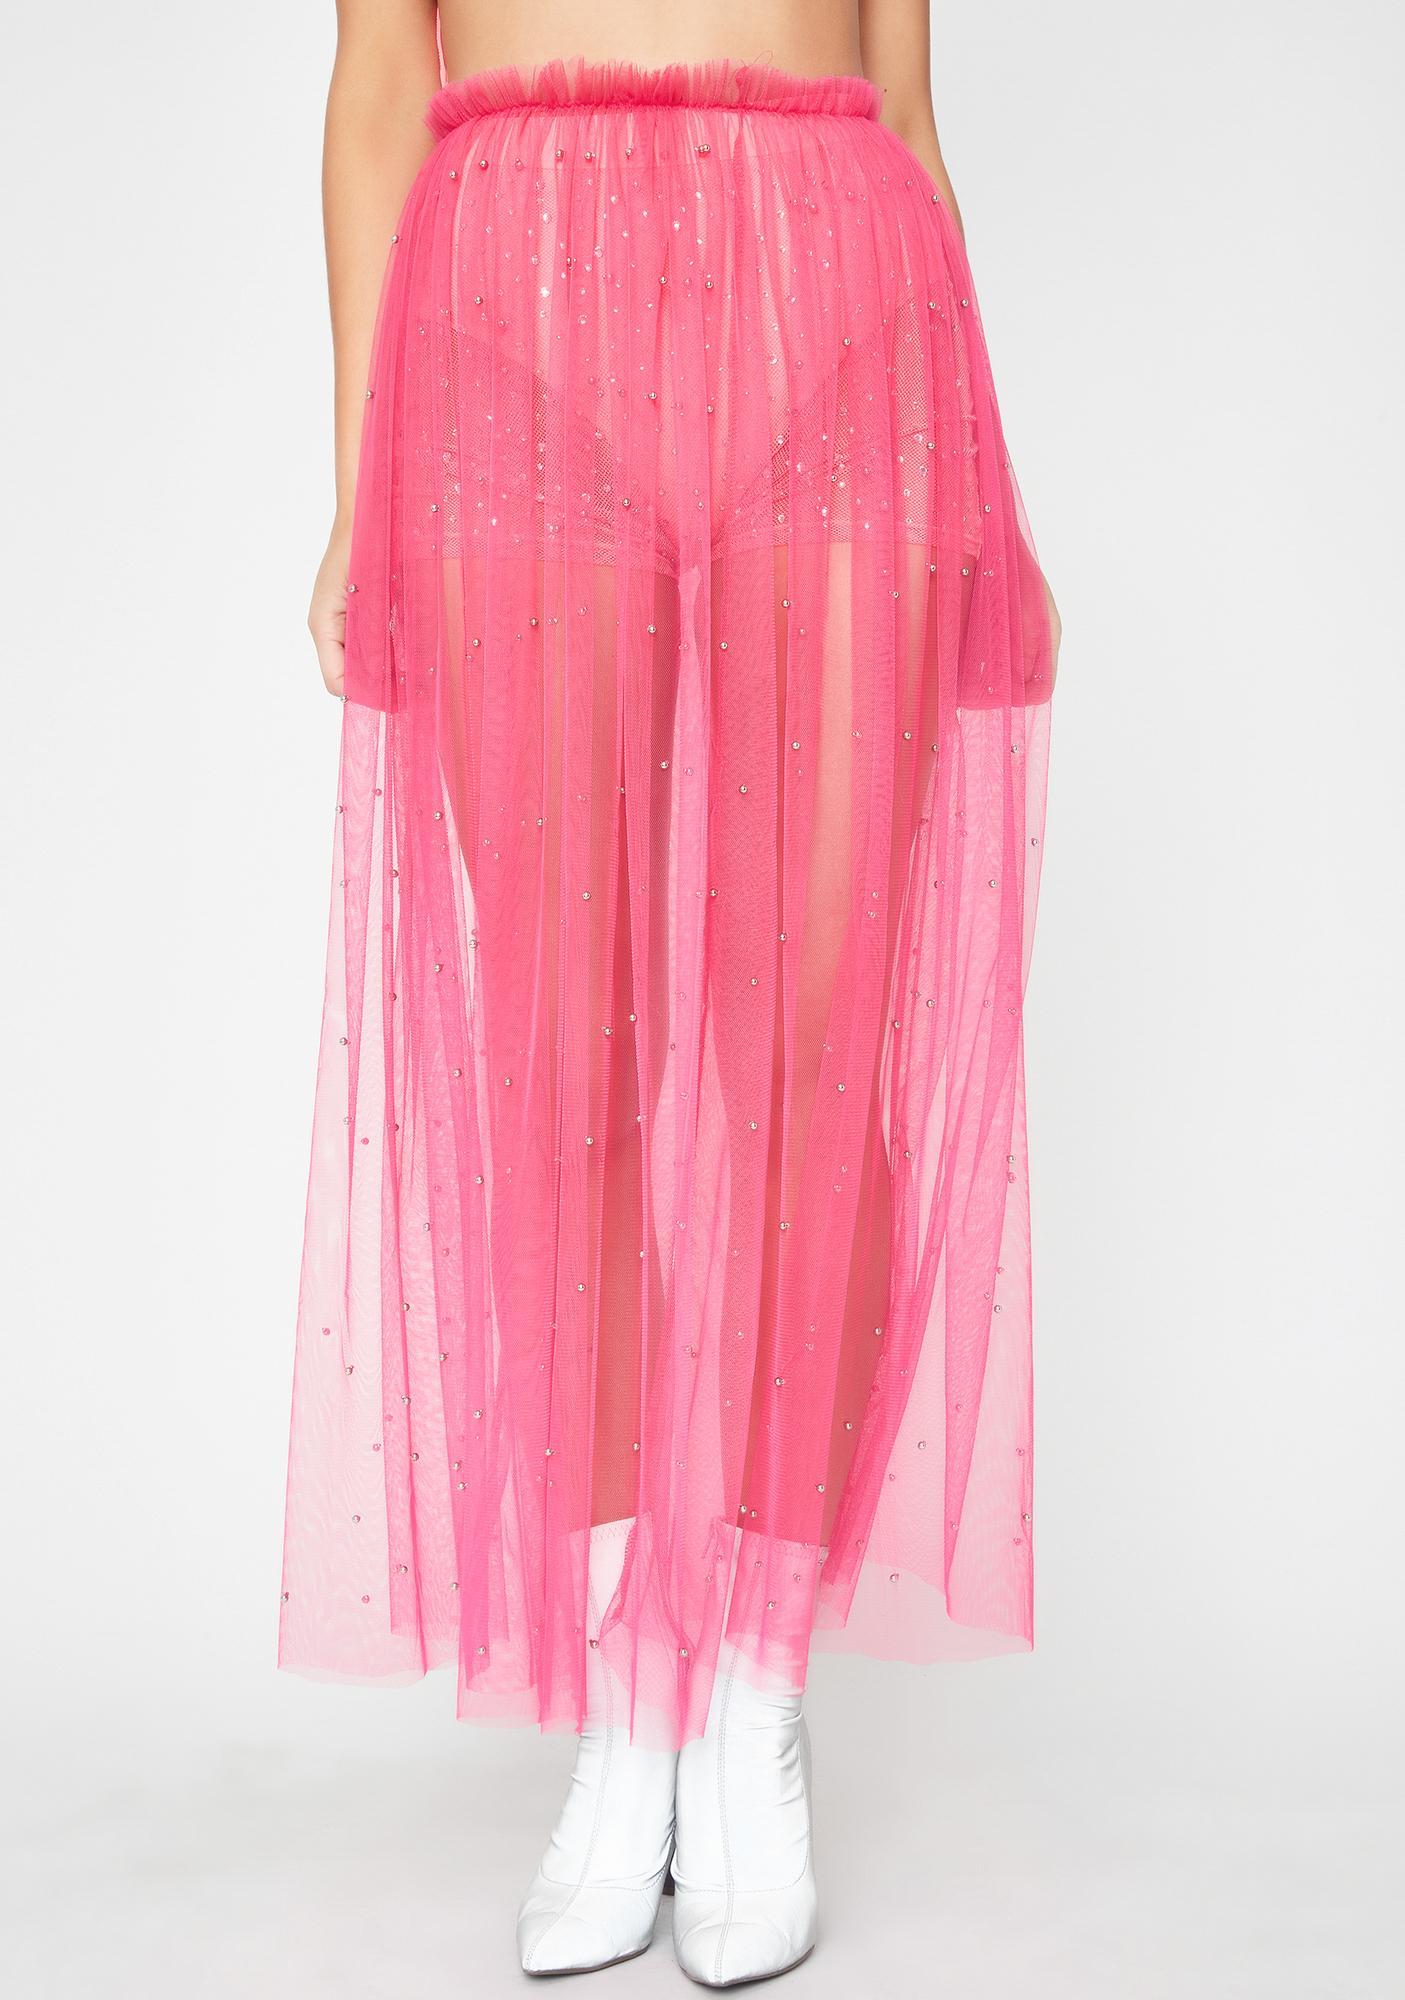 Pixie Wild AF Tulle Skirt